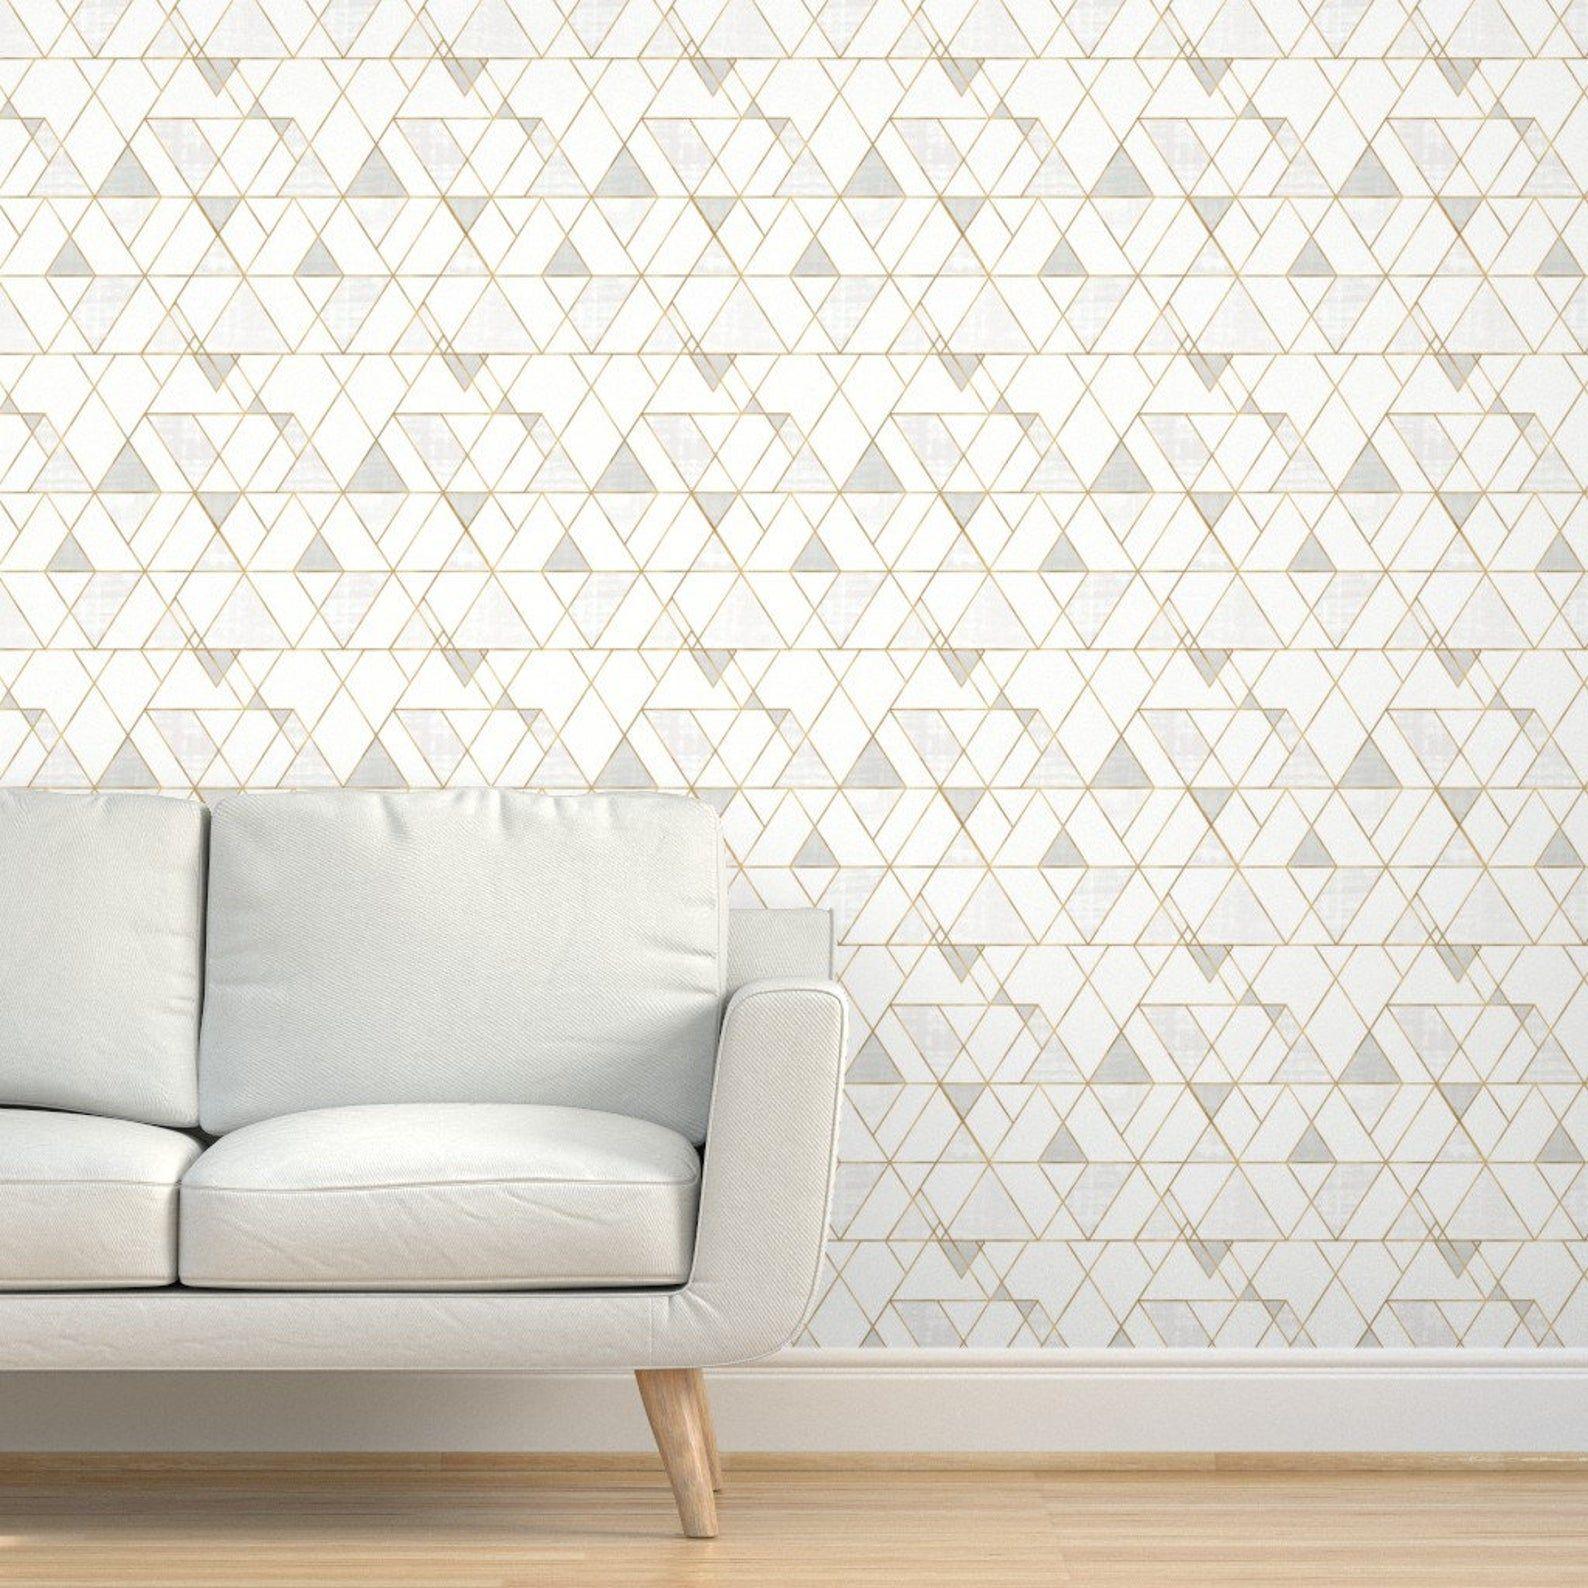 Mod Wallpaper Mod Triangles White Gold 12 Repeat By Etsy White And Gold Wallpaper Gold Wallpaper Textured Walls